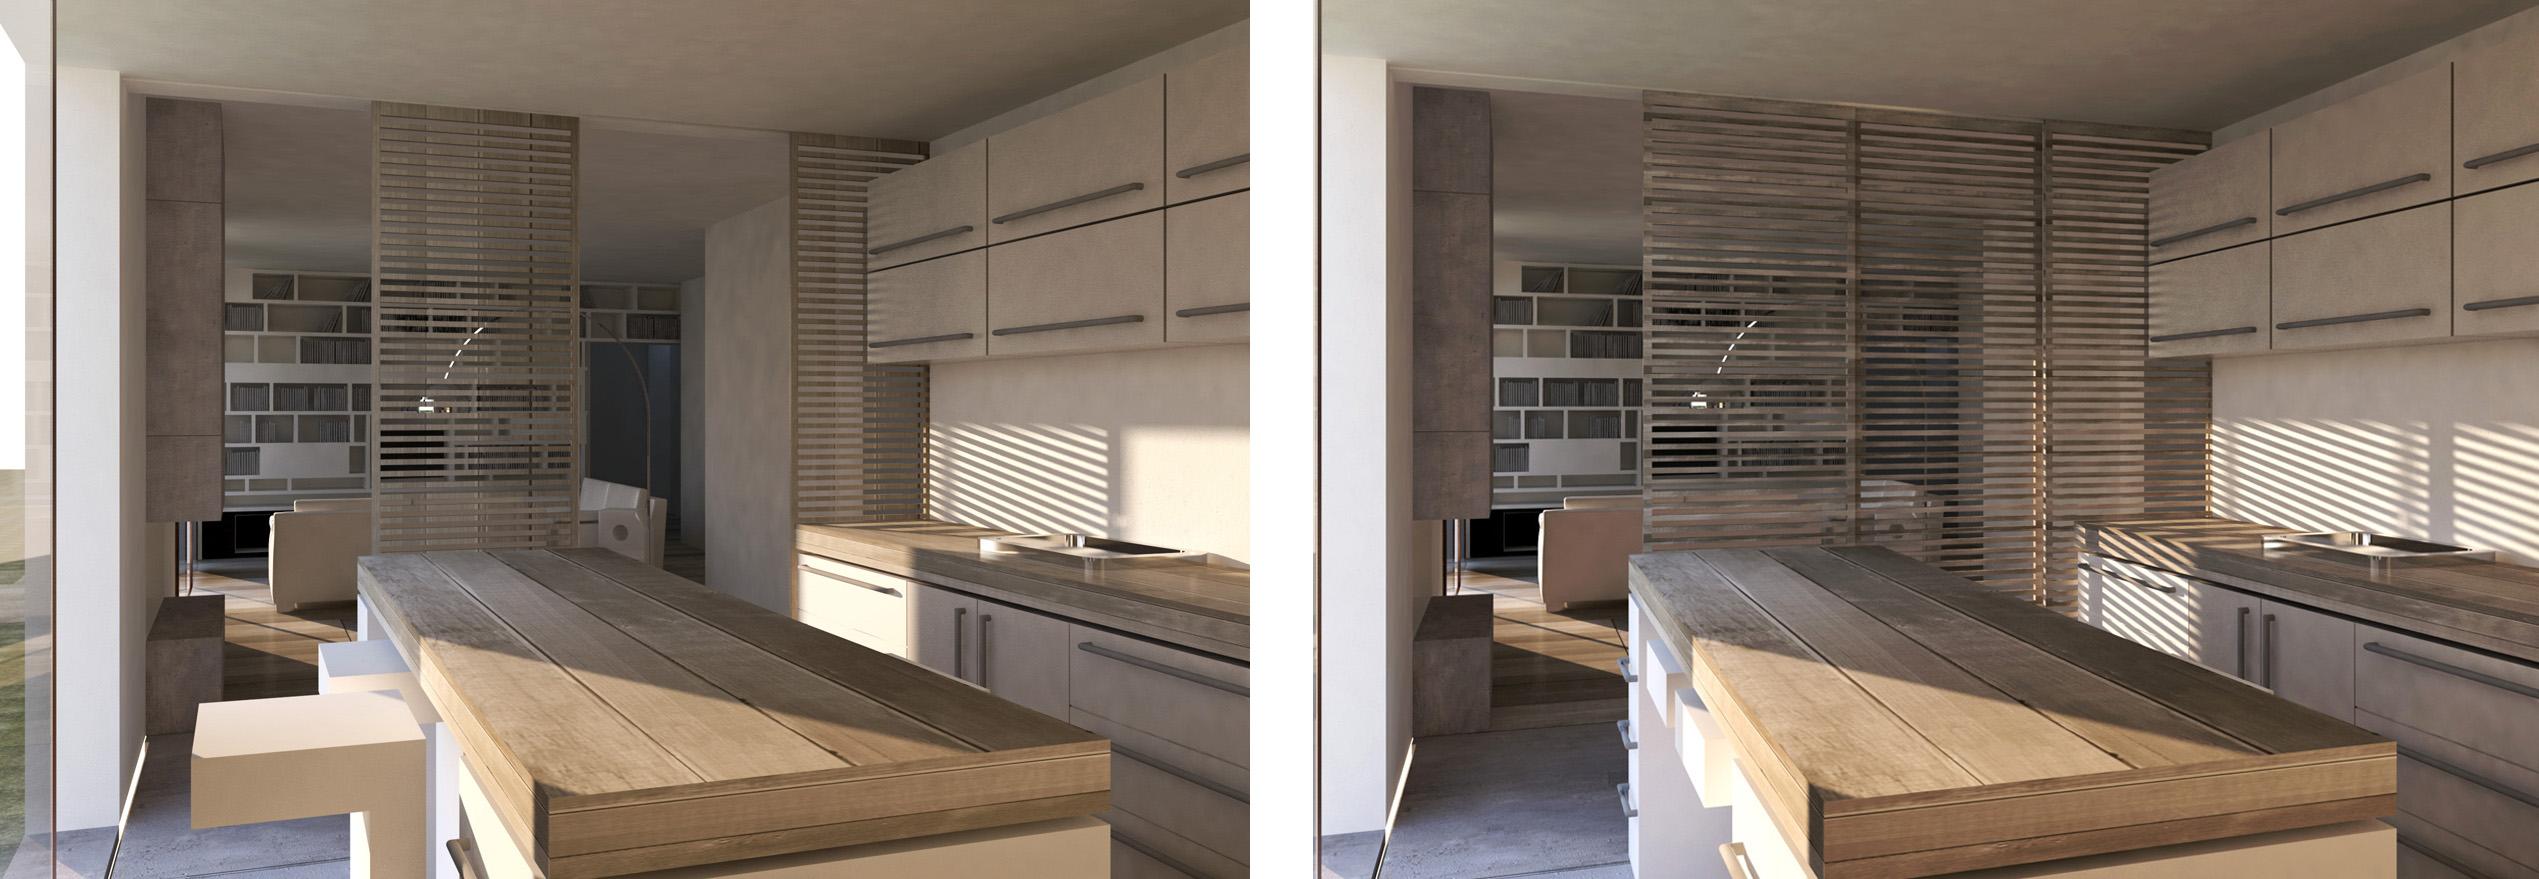 Emejing Divisione Cucina Soggiorno Photos - House Design Ideas 2018 ...